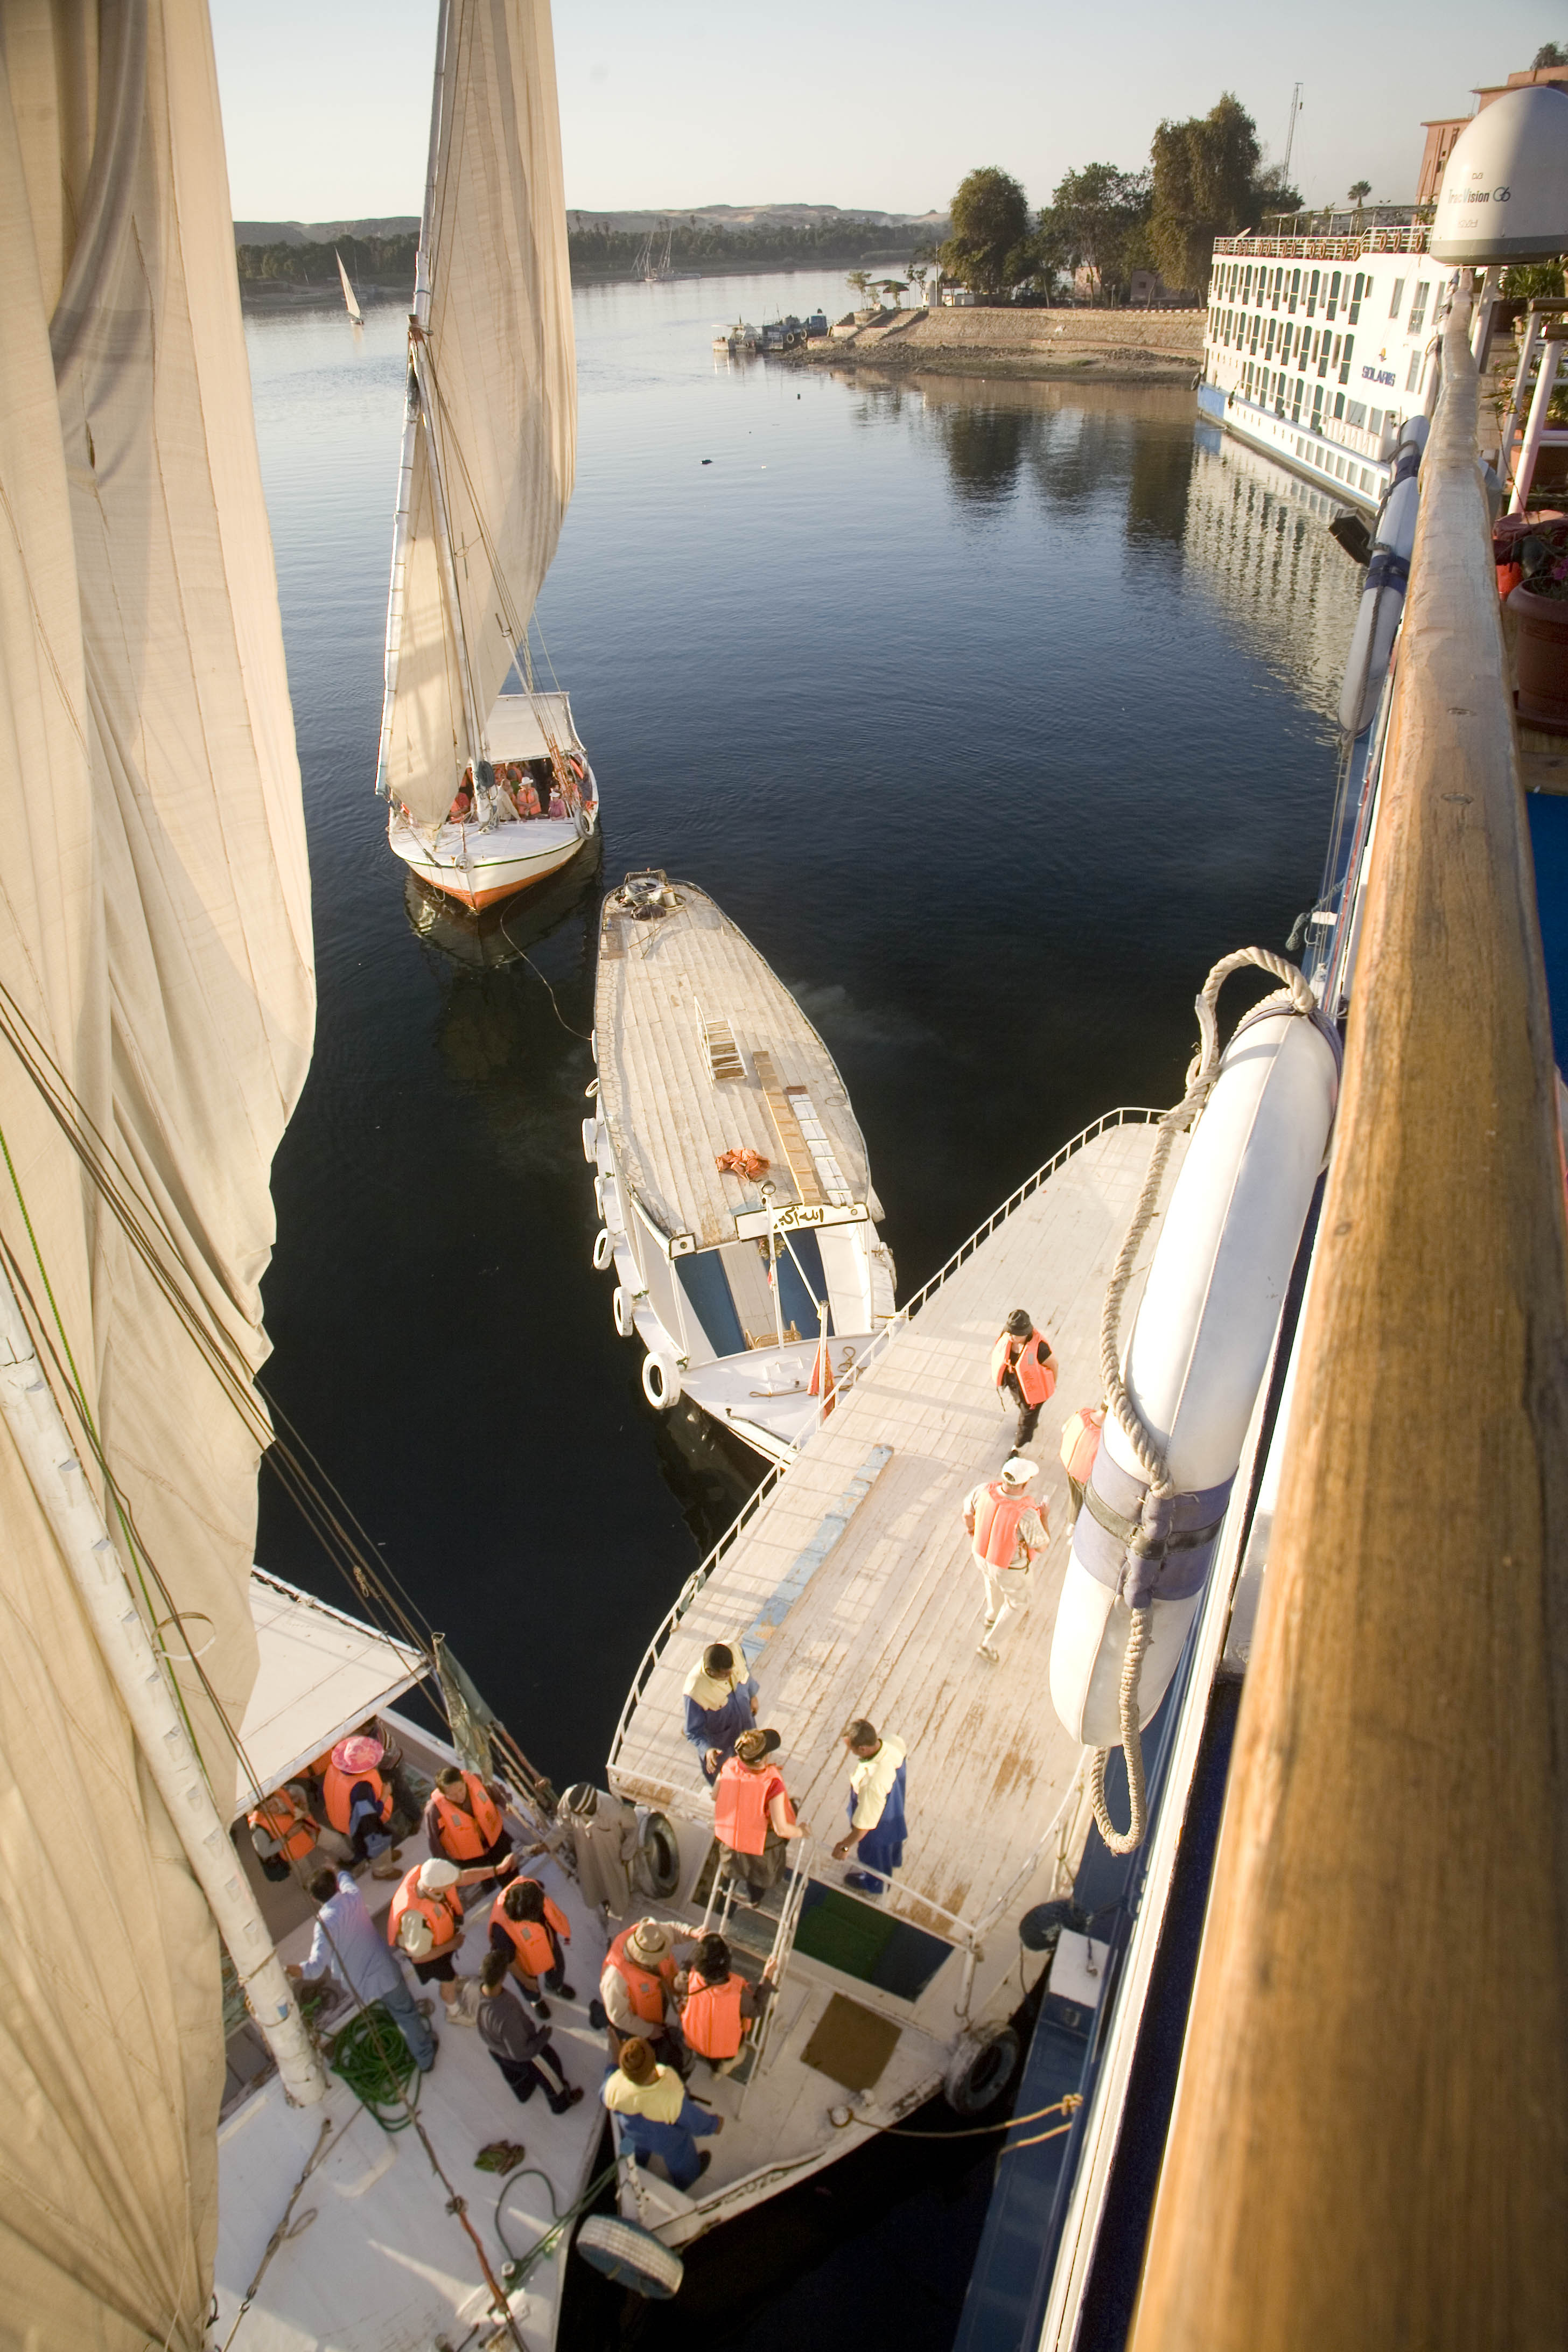 Cruise passengers return from Felluca sailing